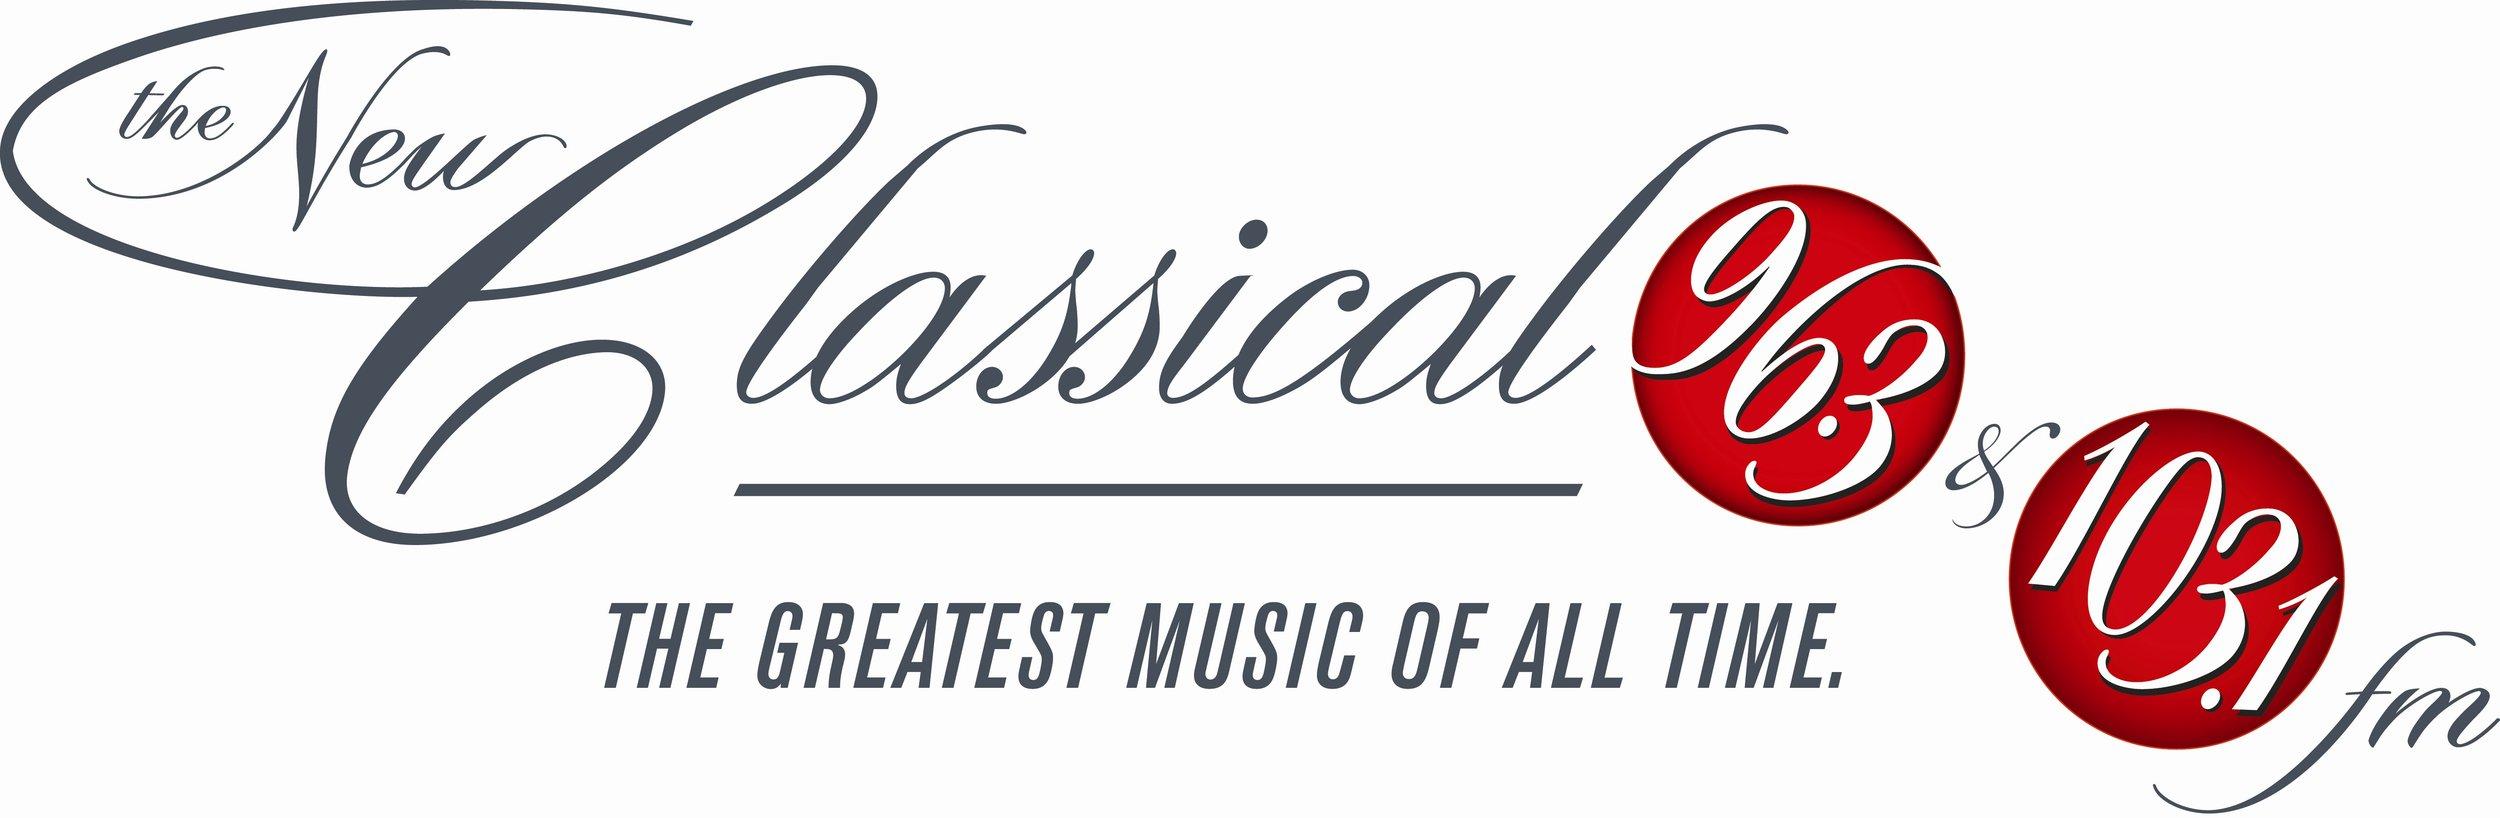 classical 96.3 & 103.1 fm radio 2015.jpg